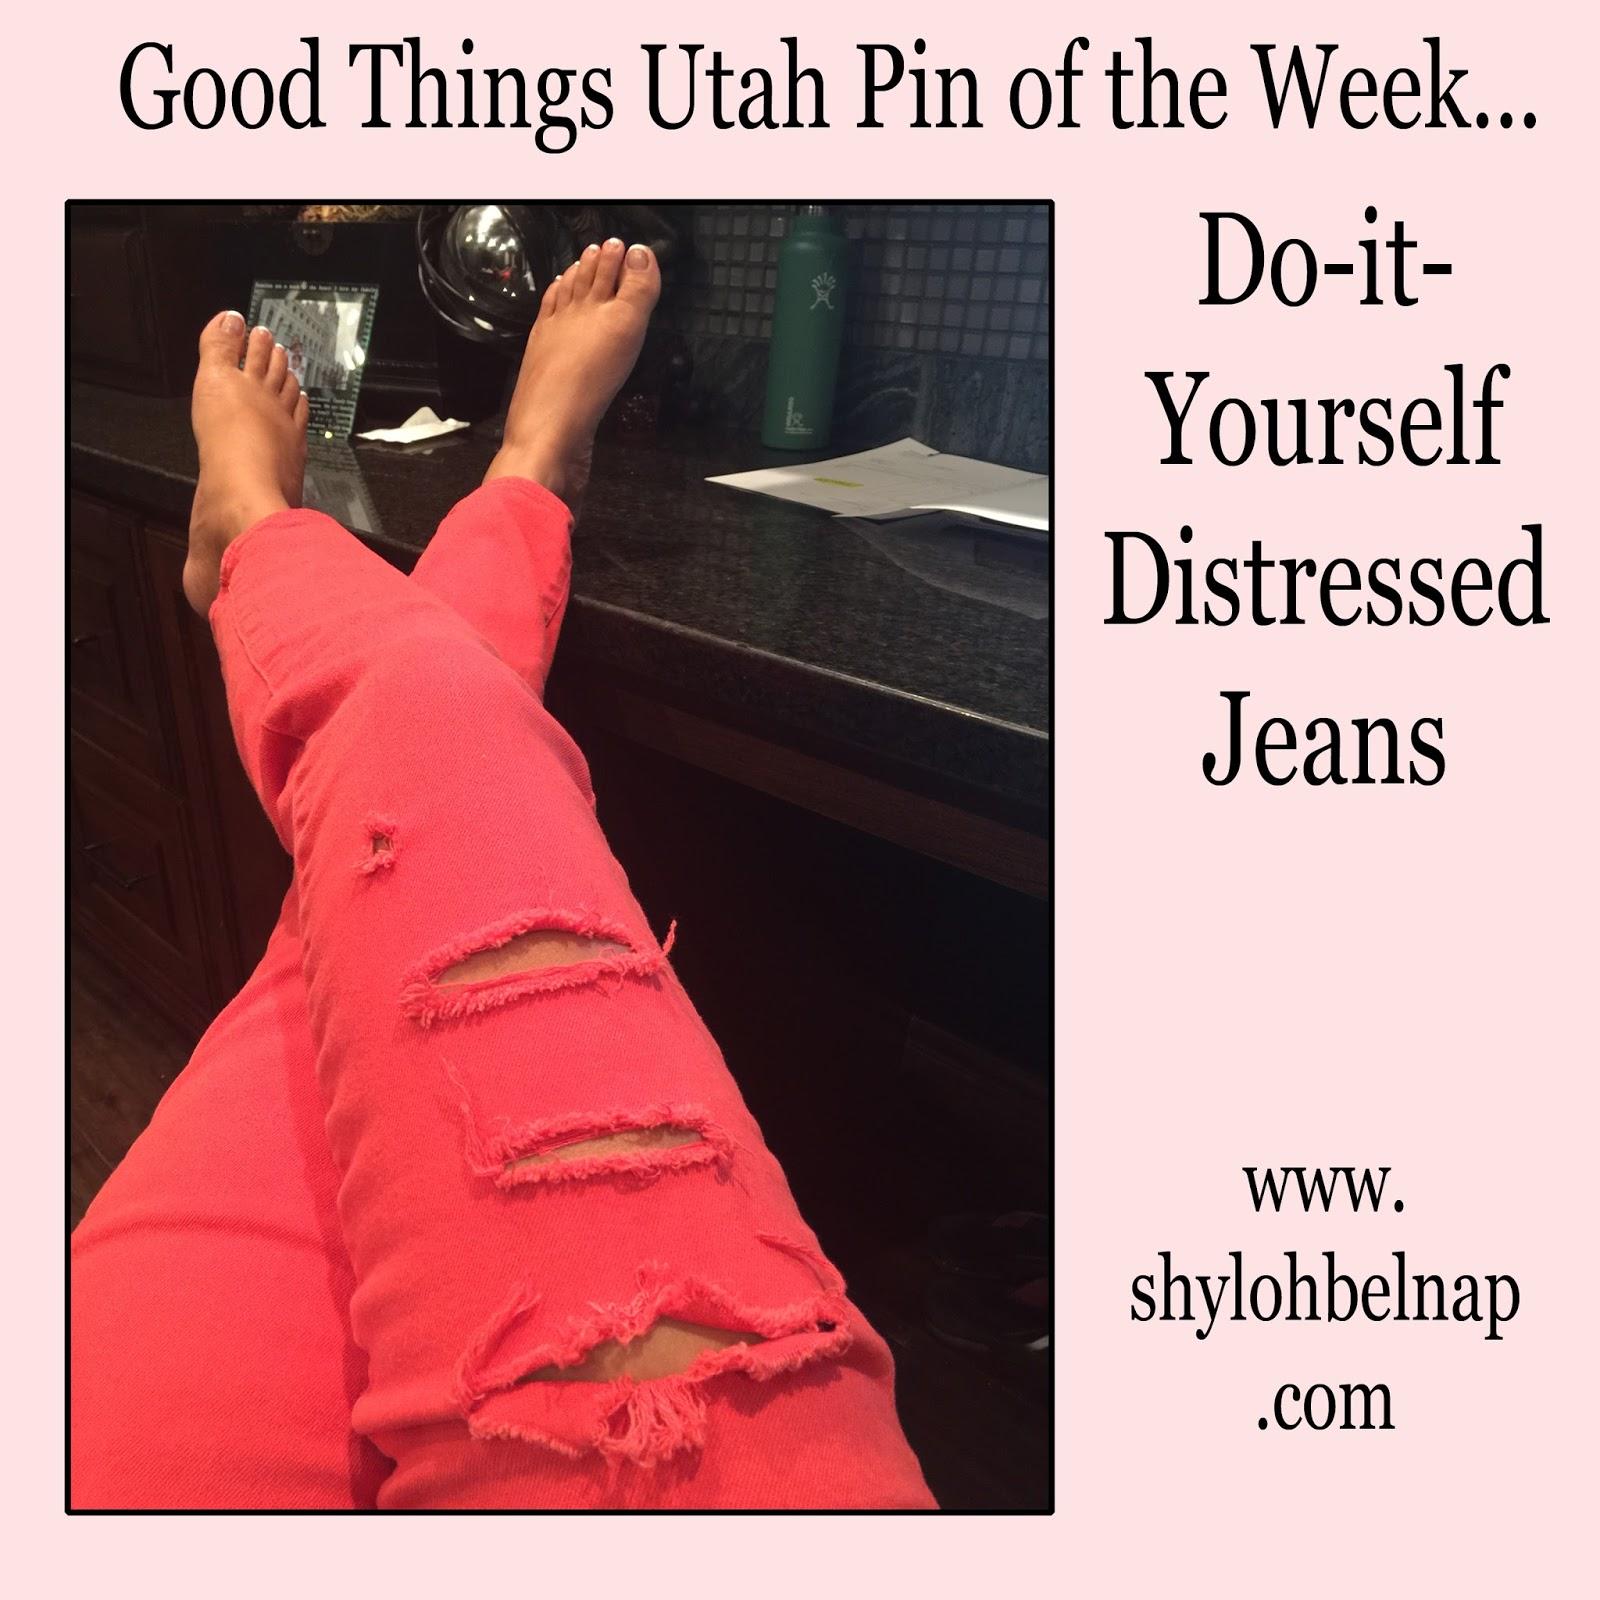 Shyloh Belnap Diy Distressed Jeans